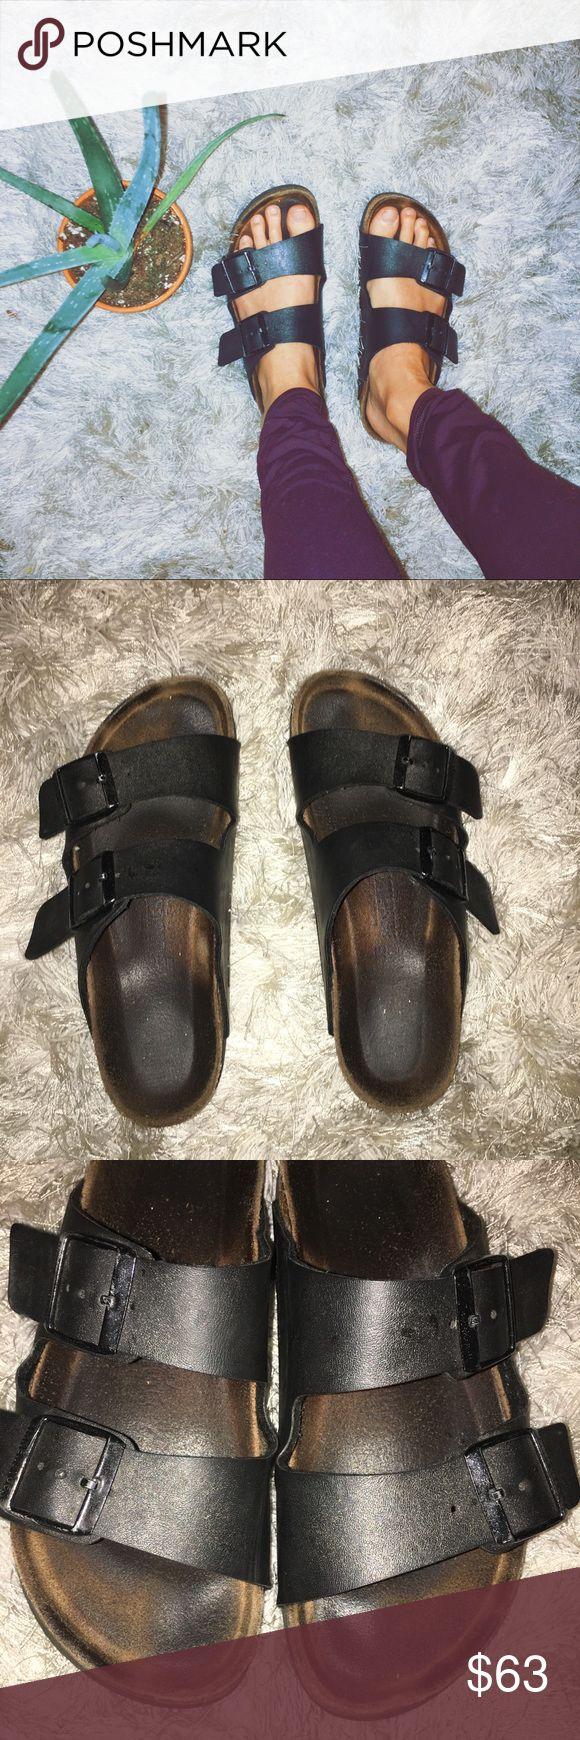 Black Birkenstocks! Black, 2 Strap Birkenstocks! Size 38 Narrow Birkenstock Shoes